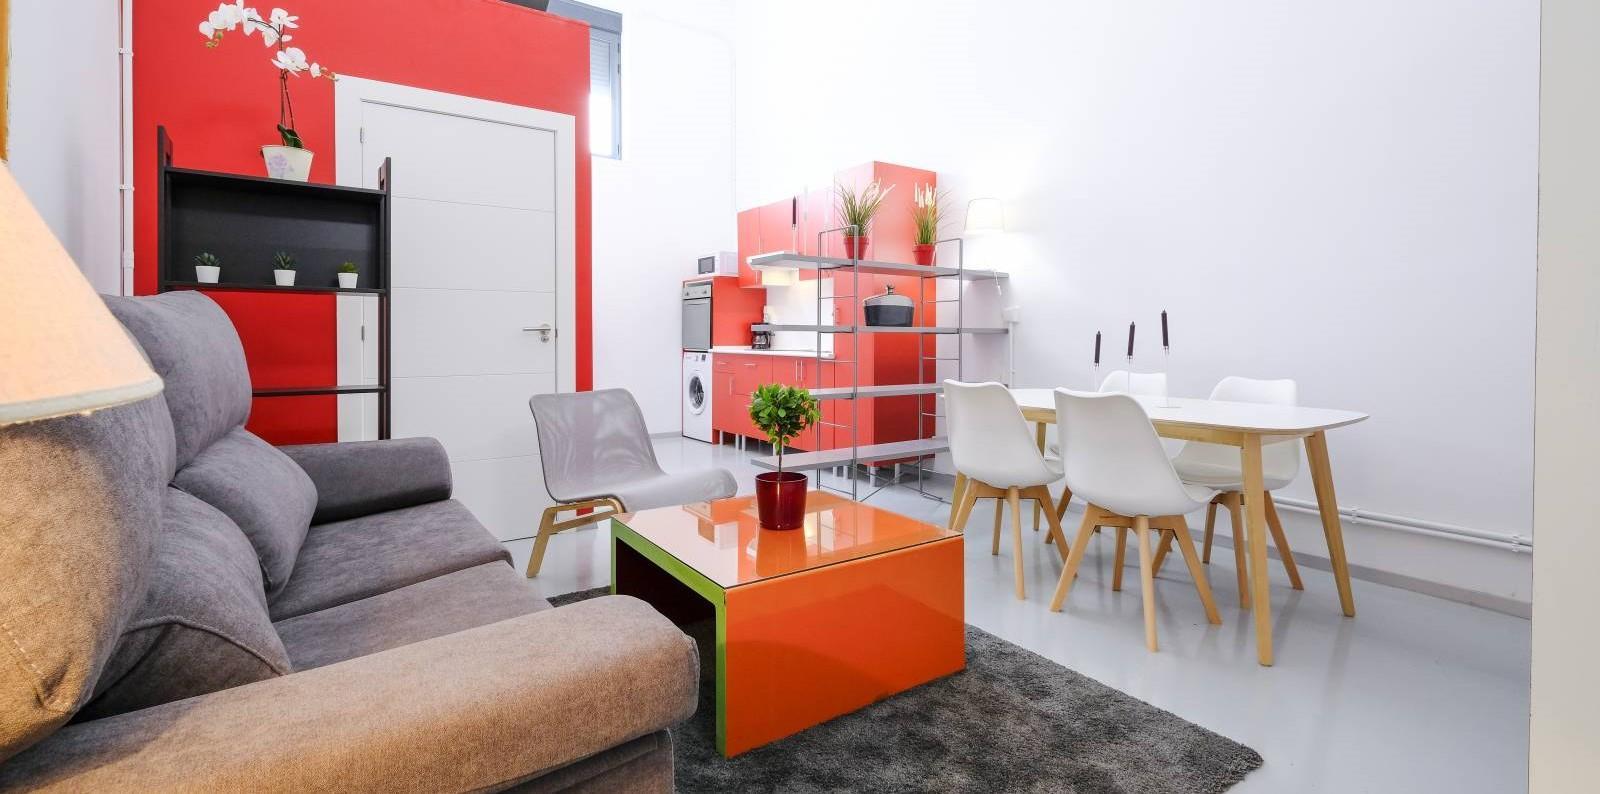 Mella - Studio in the centre of Madrid